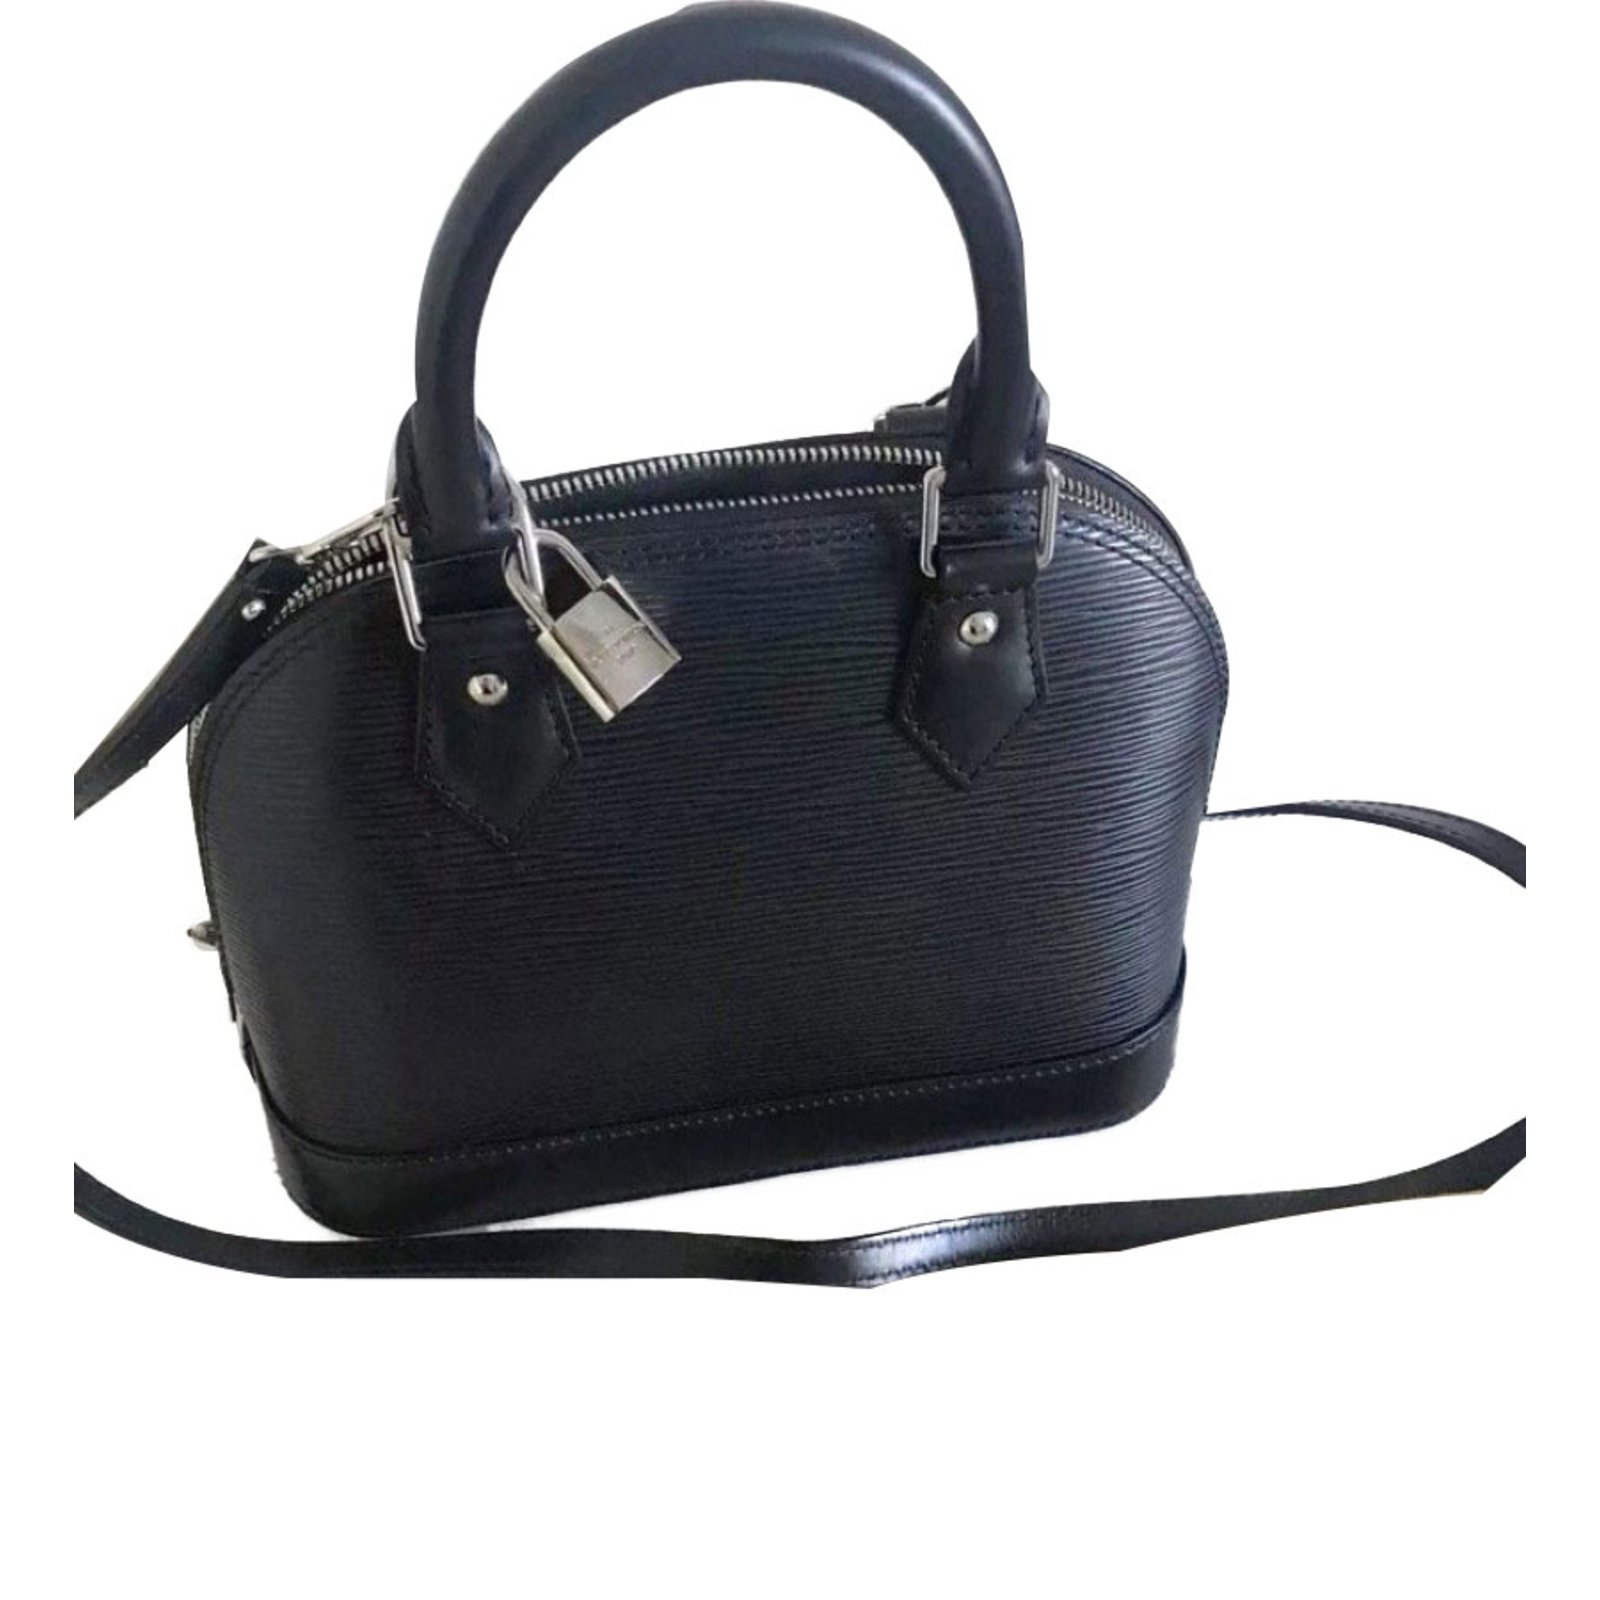 82e32b65dc12 Louis Vuitton Alma Bb Handbags Leather Black Ref 53661 Joli Closet